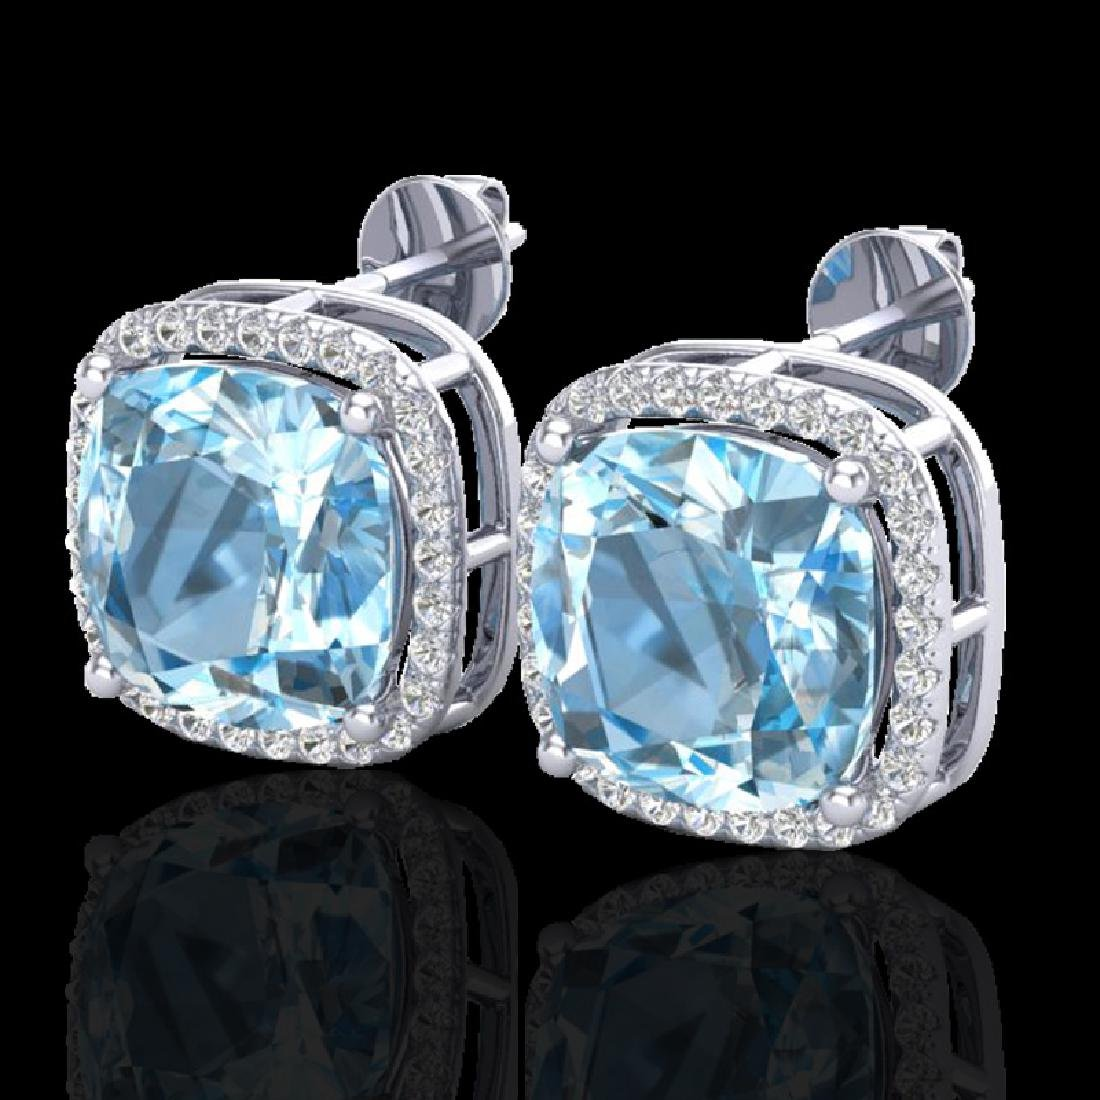 12 CTW Sky Blue Topaz & Pave Halo VS/SI Diamond